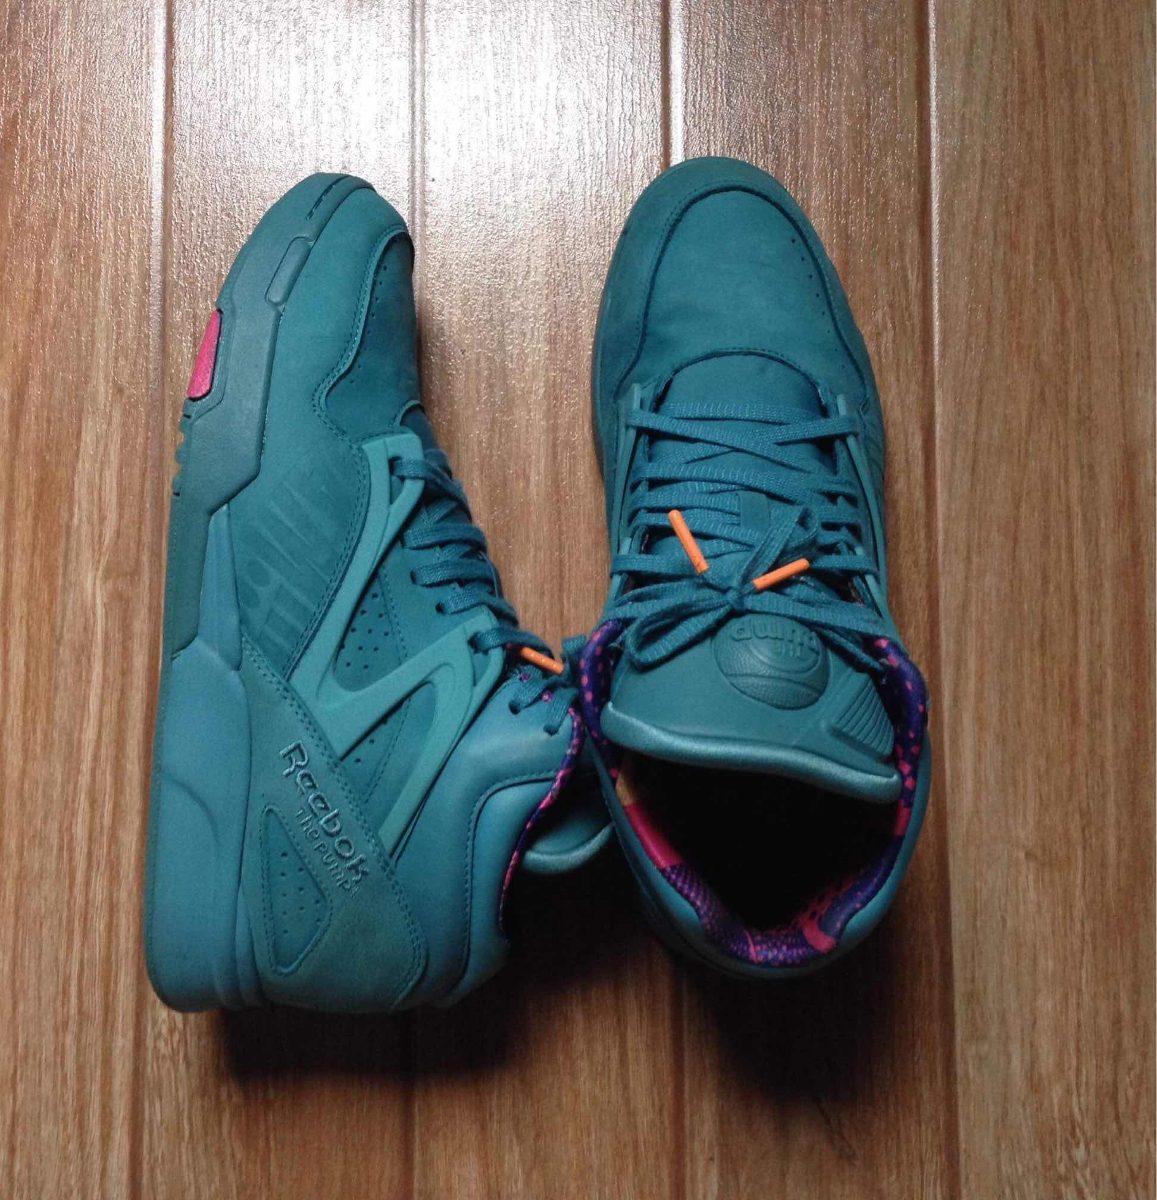 sports shoes 157e5 2b45f ... reebok pump lemar dauley. Carregando zoom.